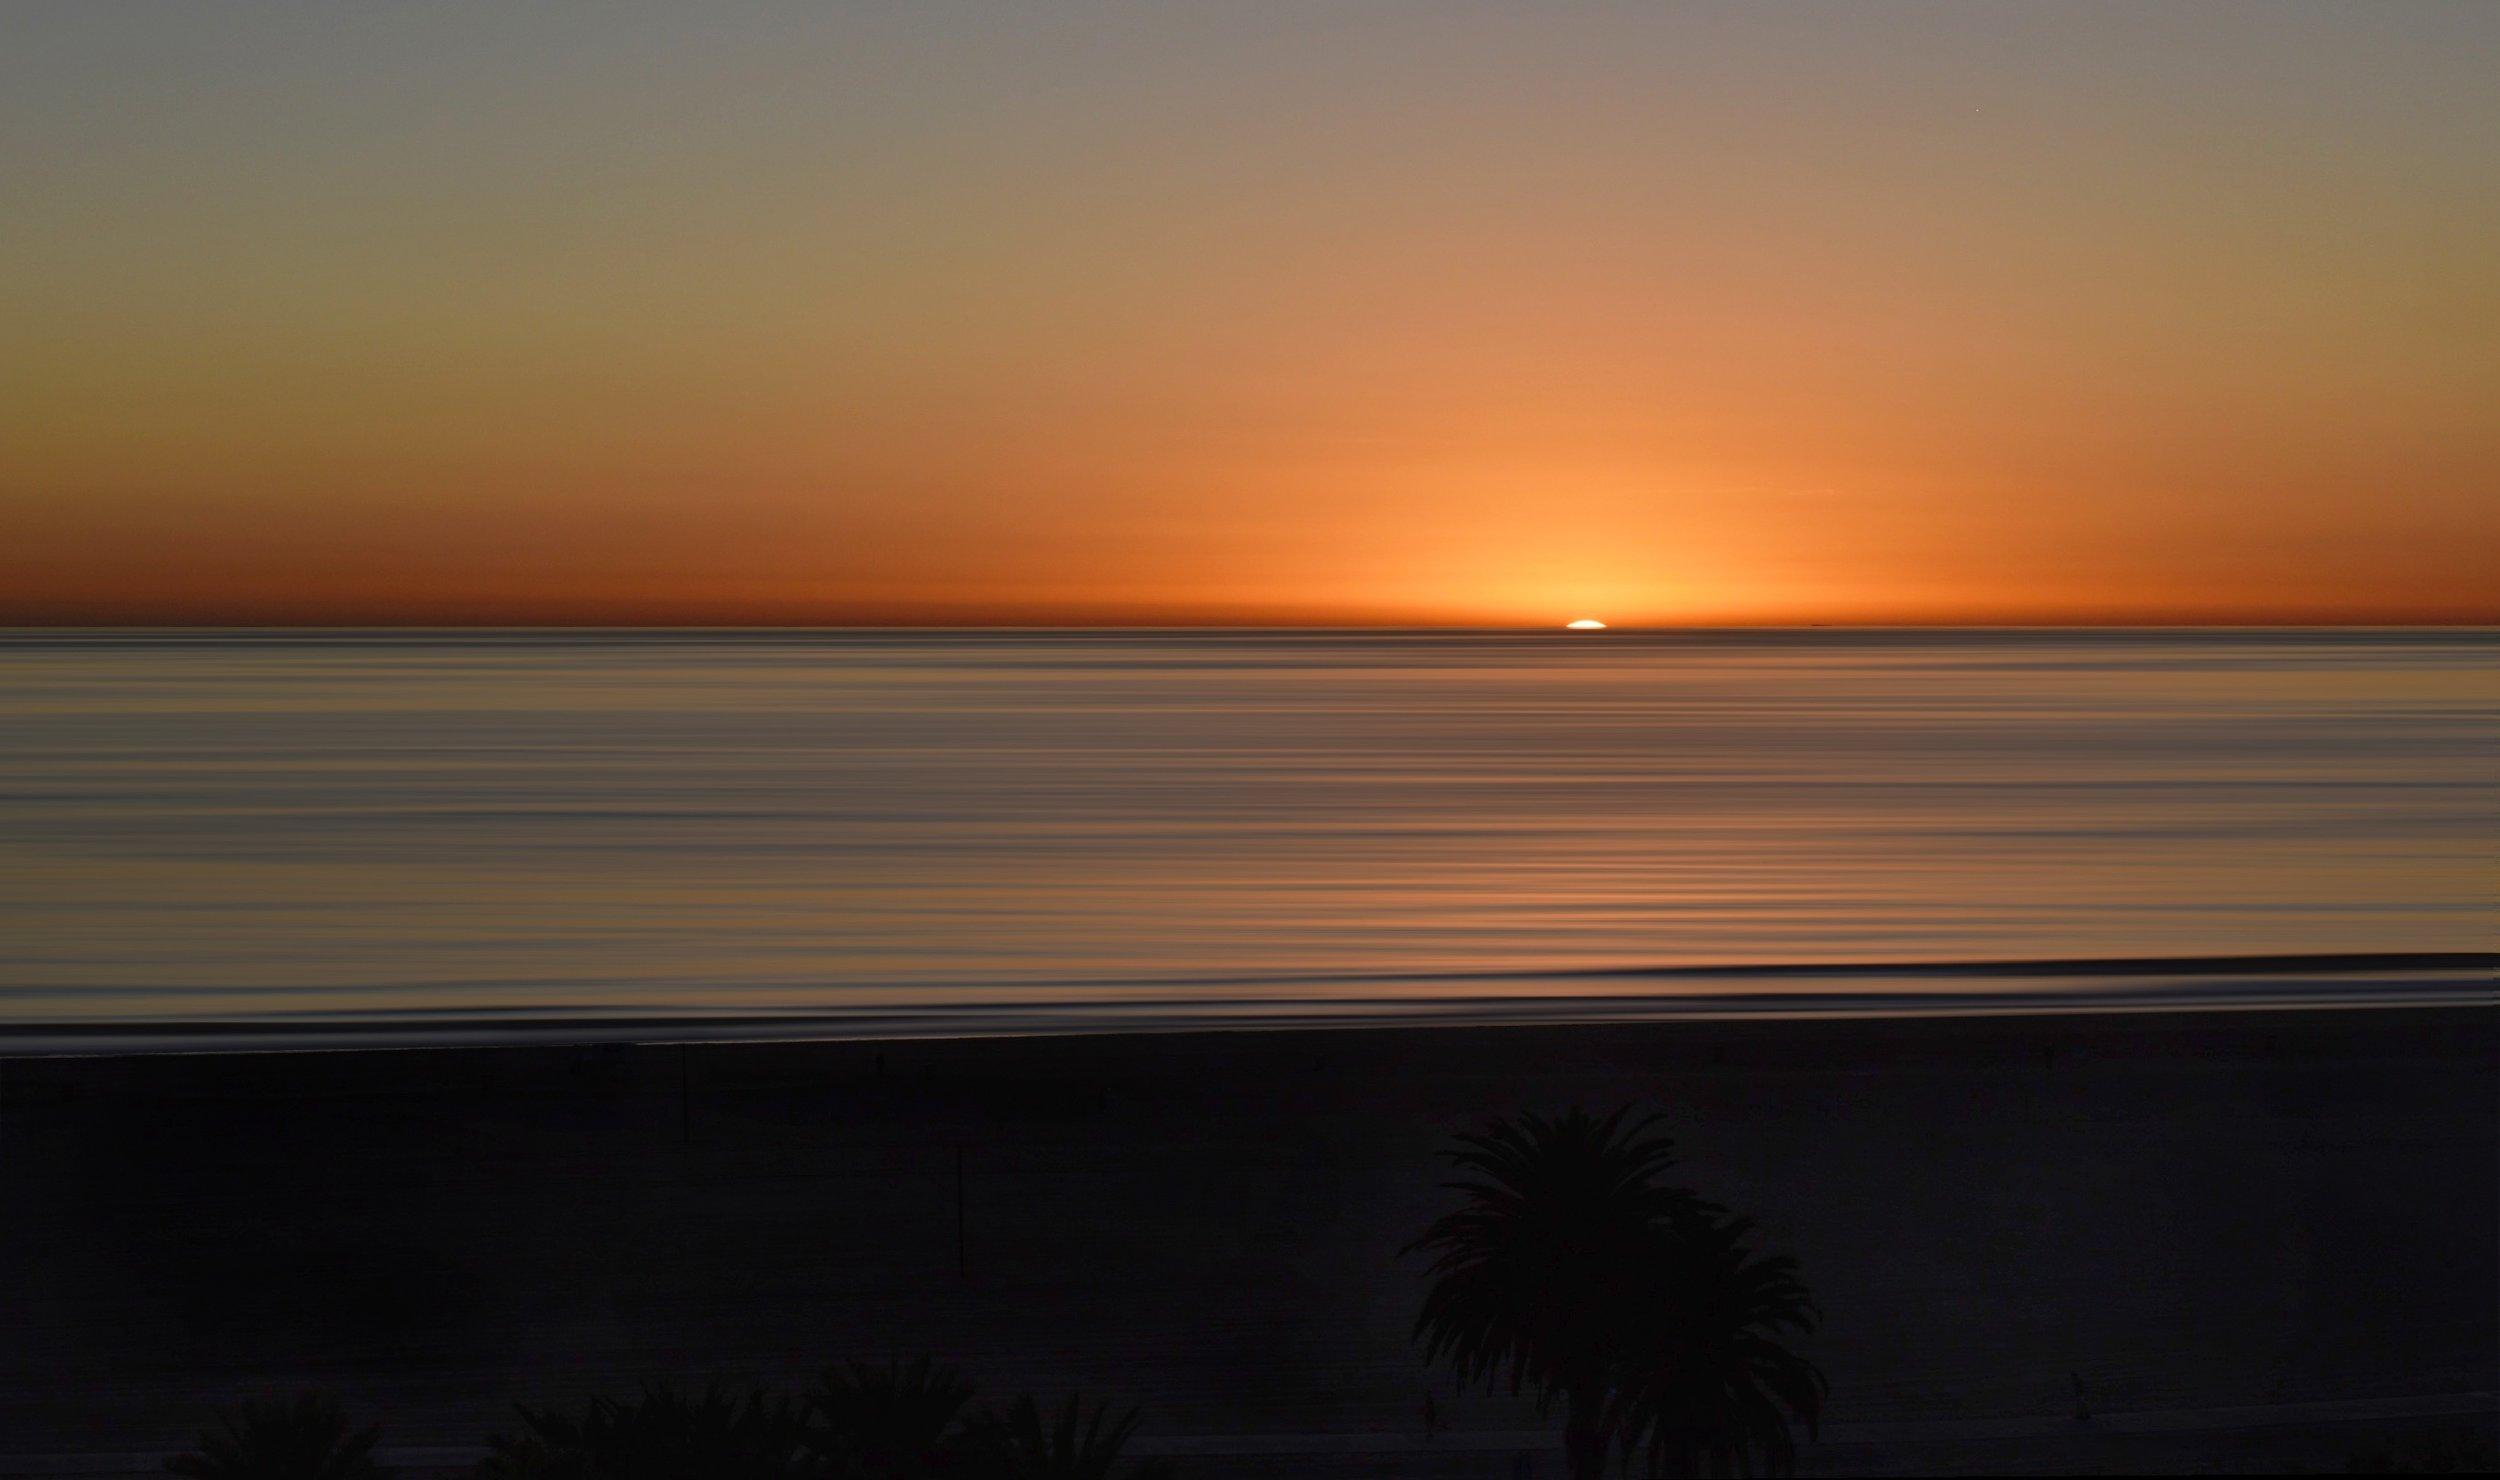 Palms enjoying sunset